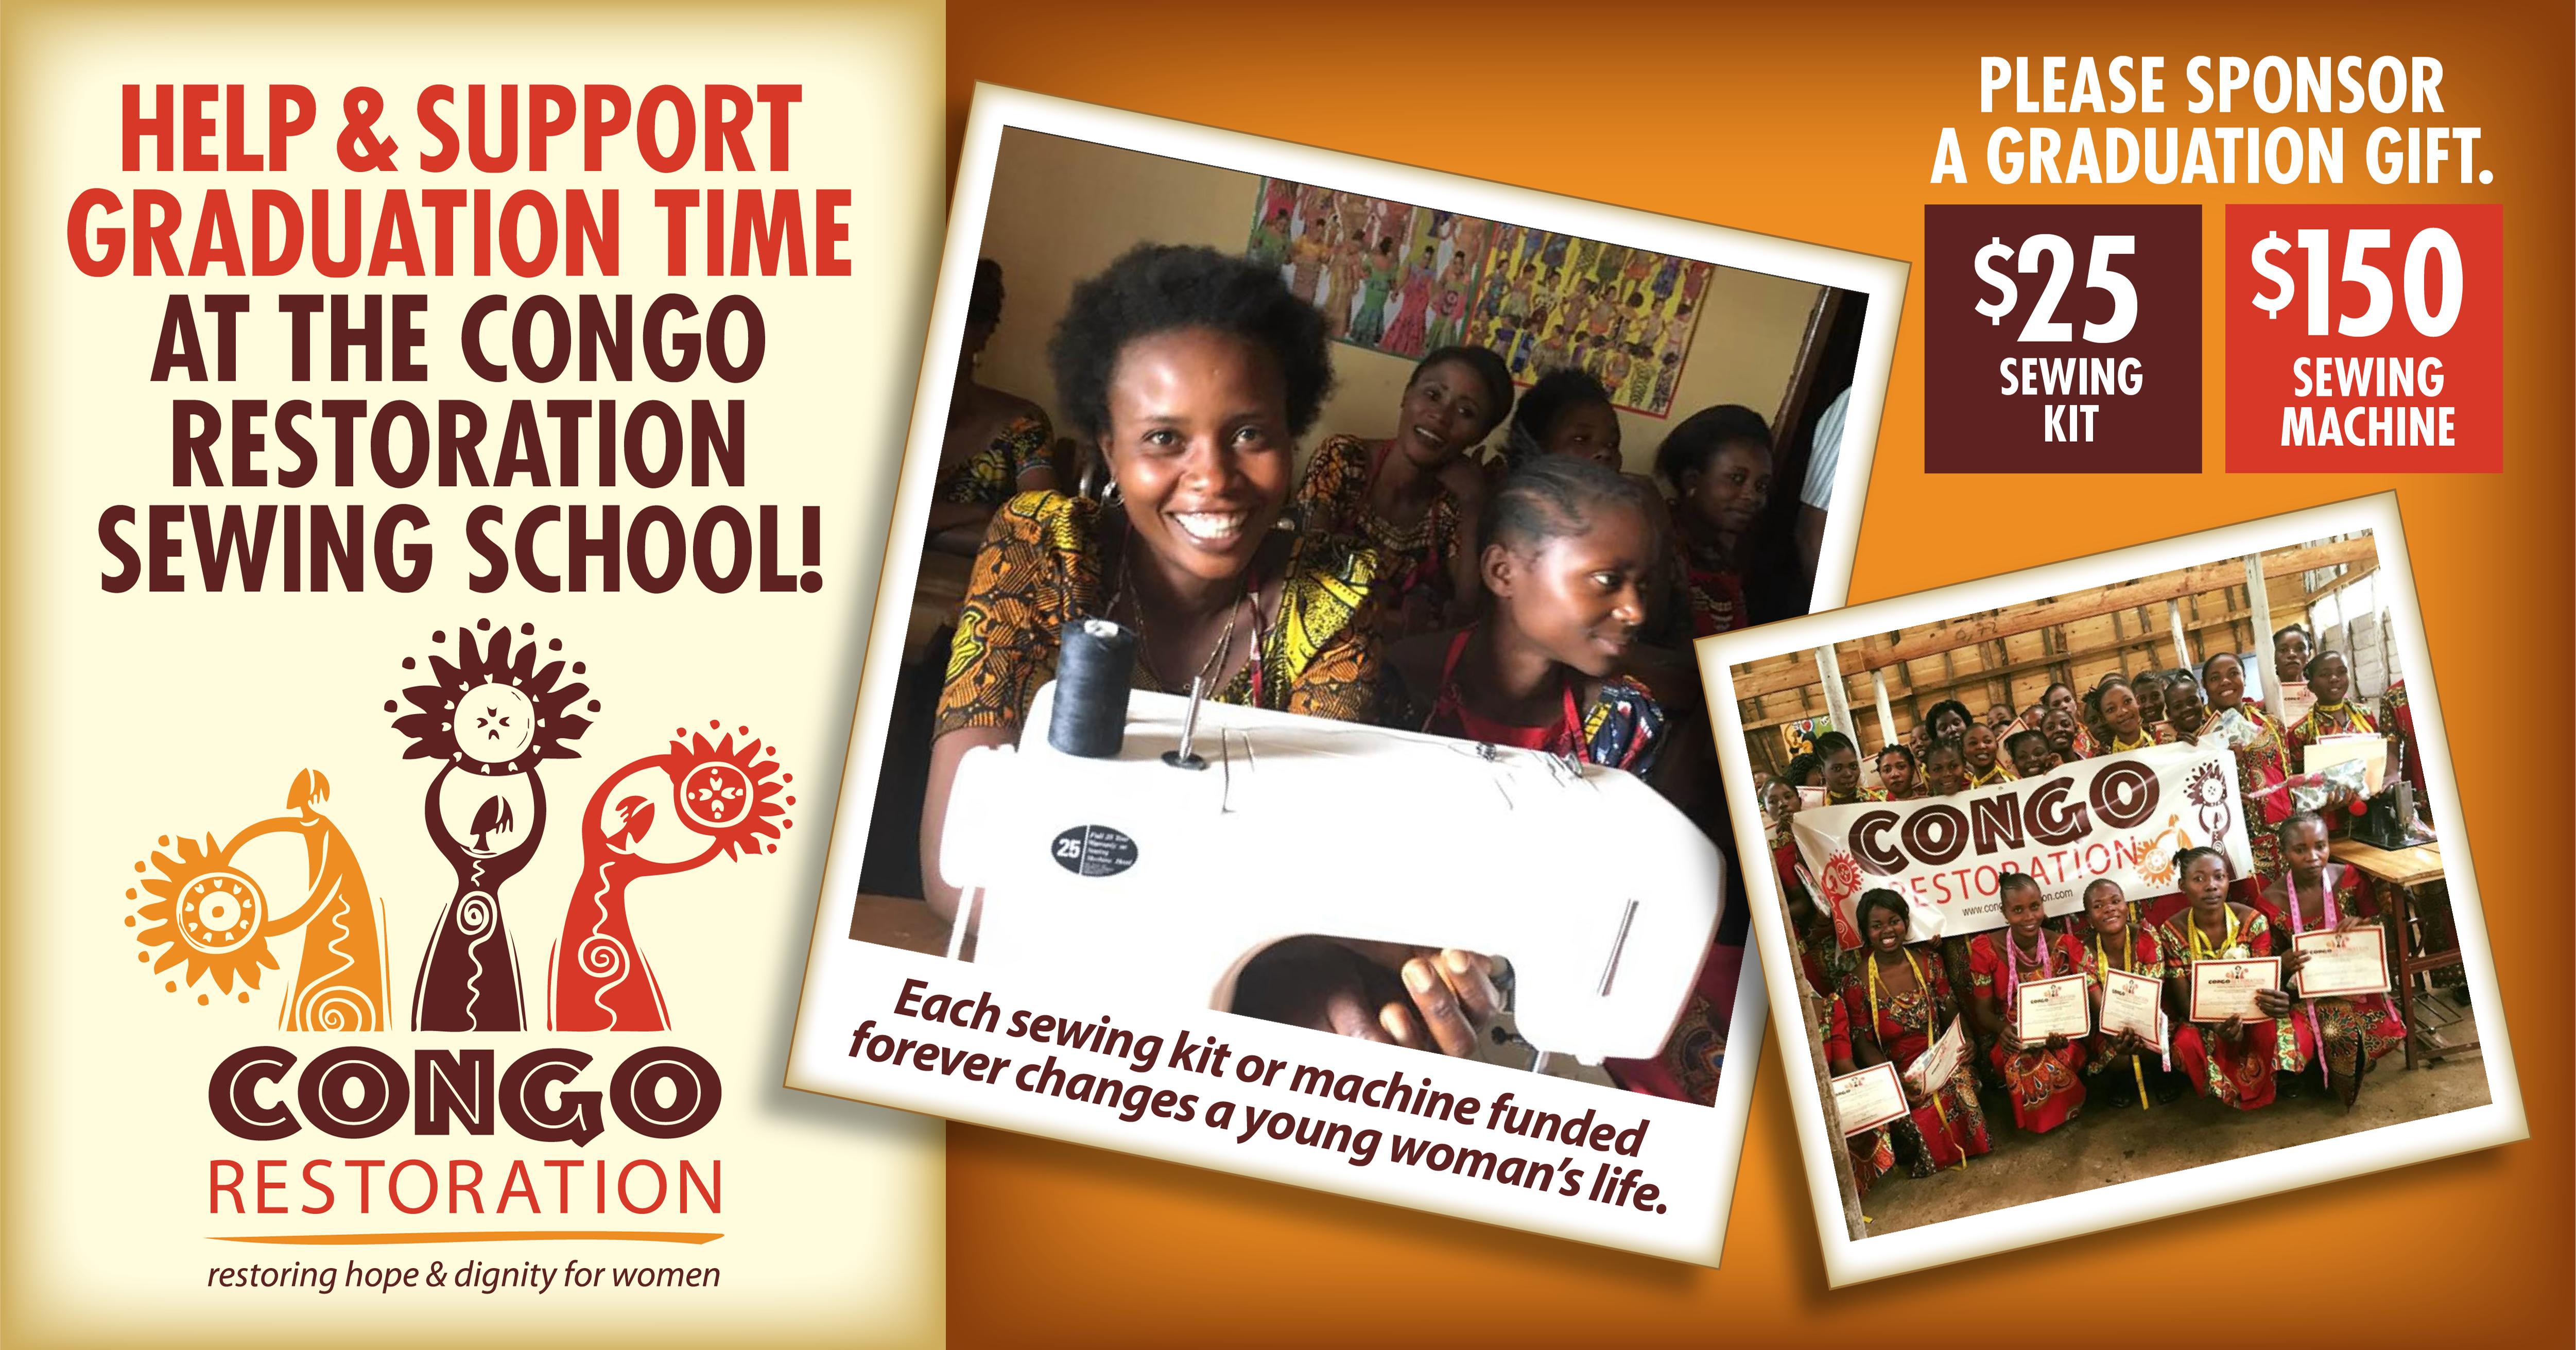 2018 Congo Sew School Ad